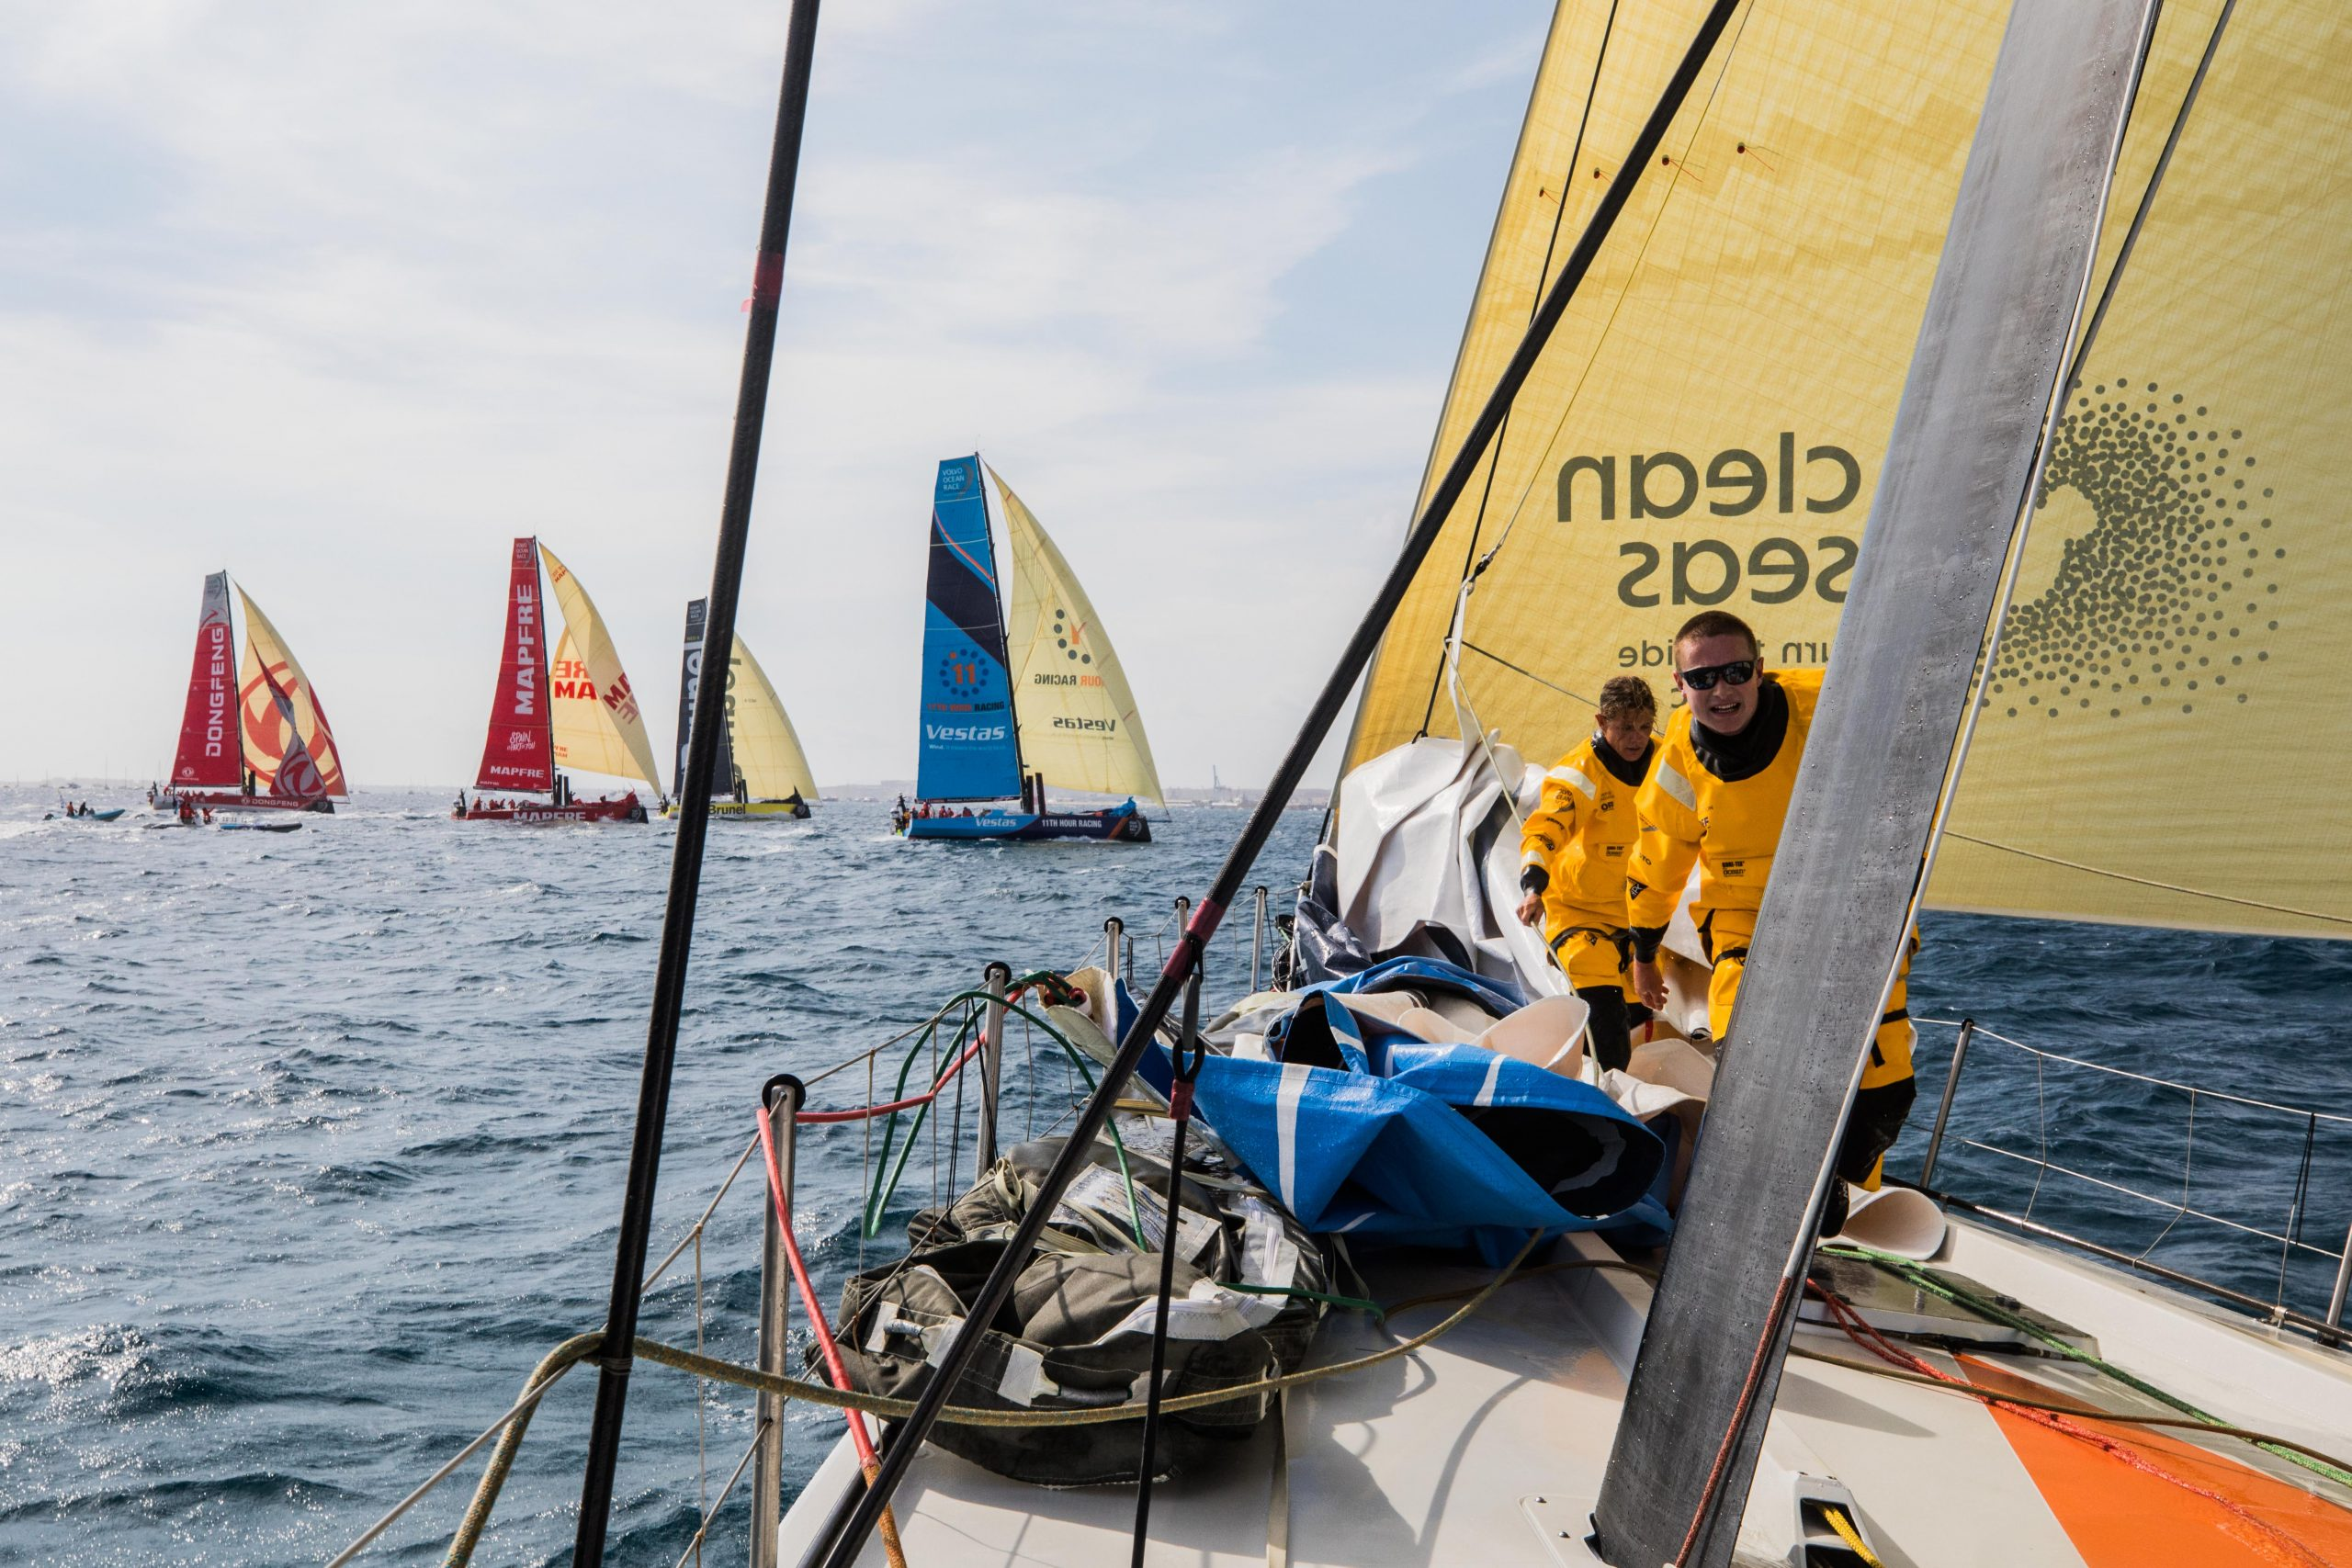 Lucas and Liz Wardley on the bow at the race start. Photo Jen Edney/Volvo Ocean Race.